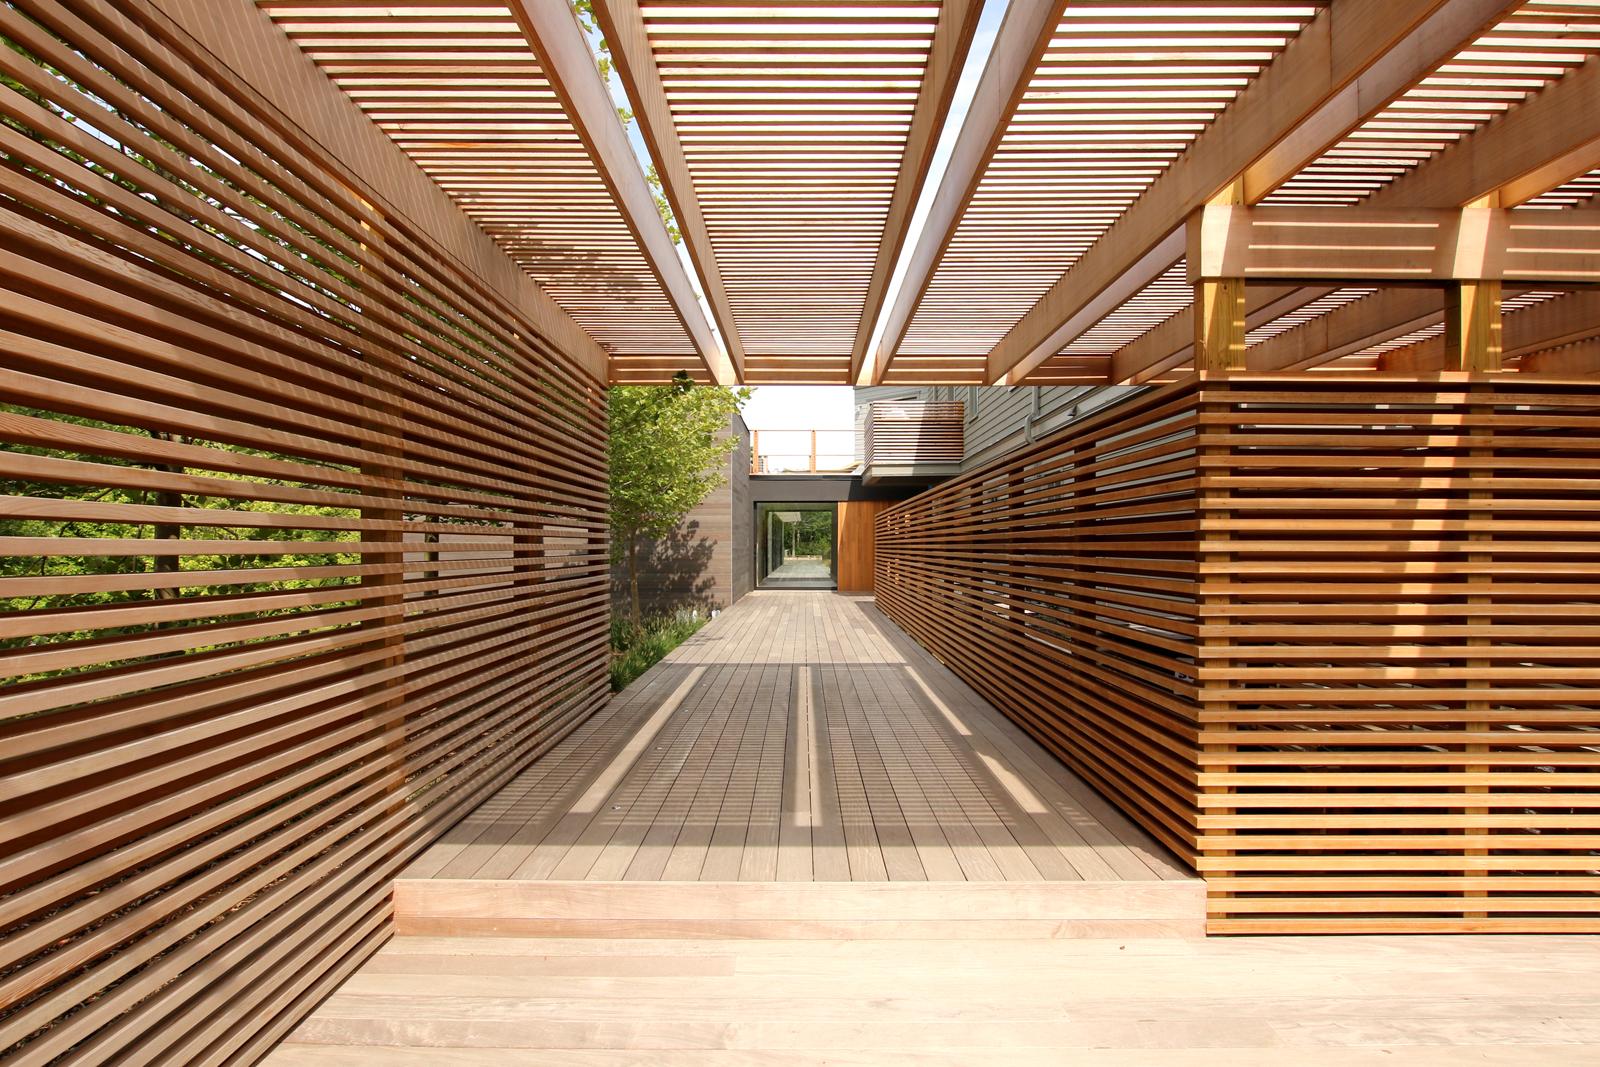 res4-resolution-4-architecture-modern-modular-house-prefab-amagansett-addition-exterior-entrance-path.jpg